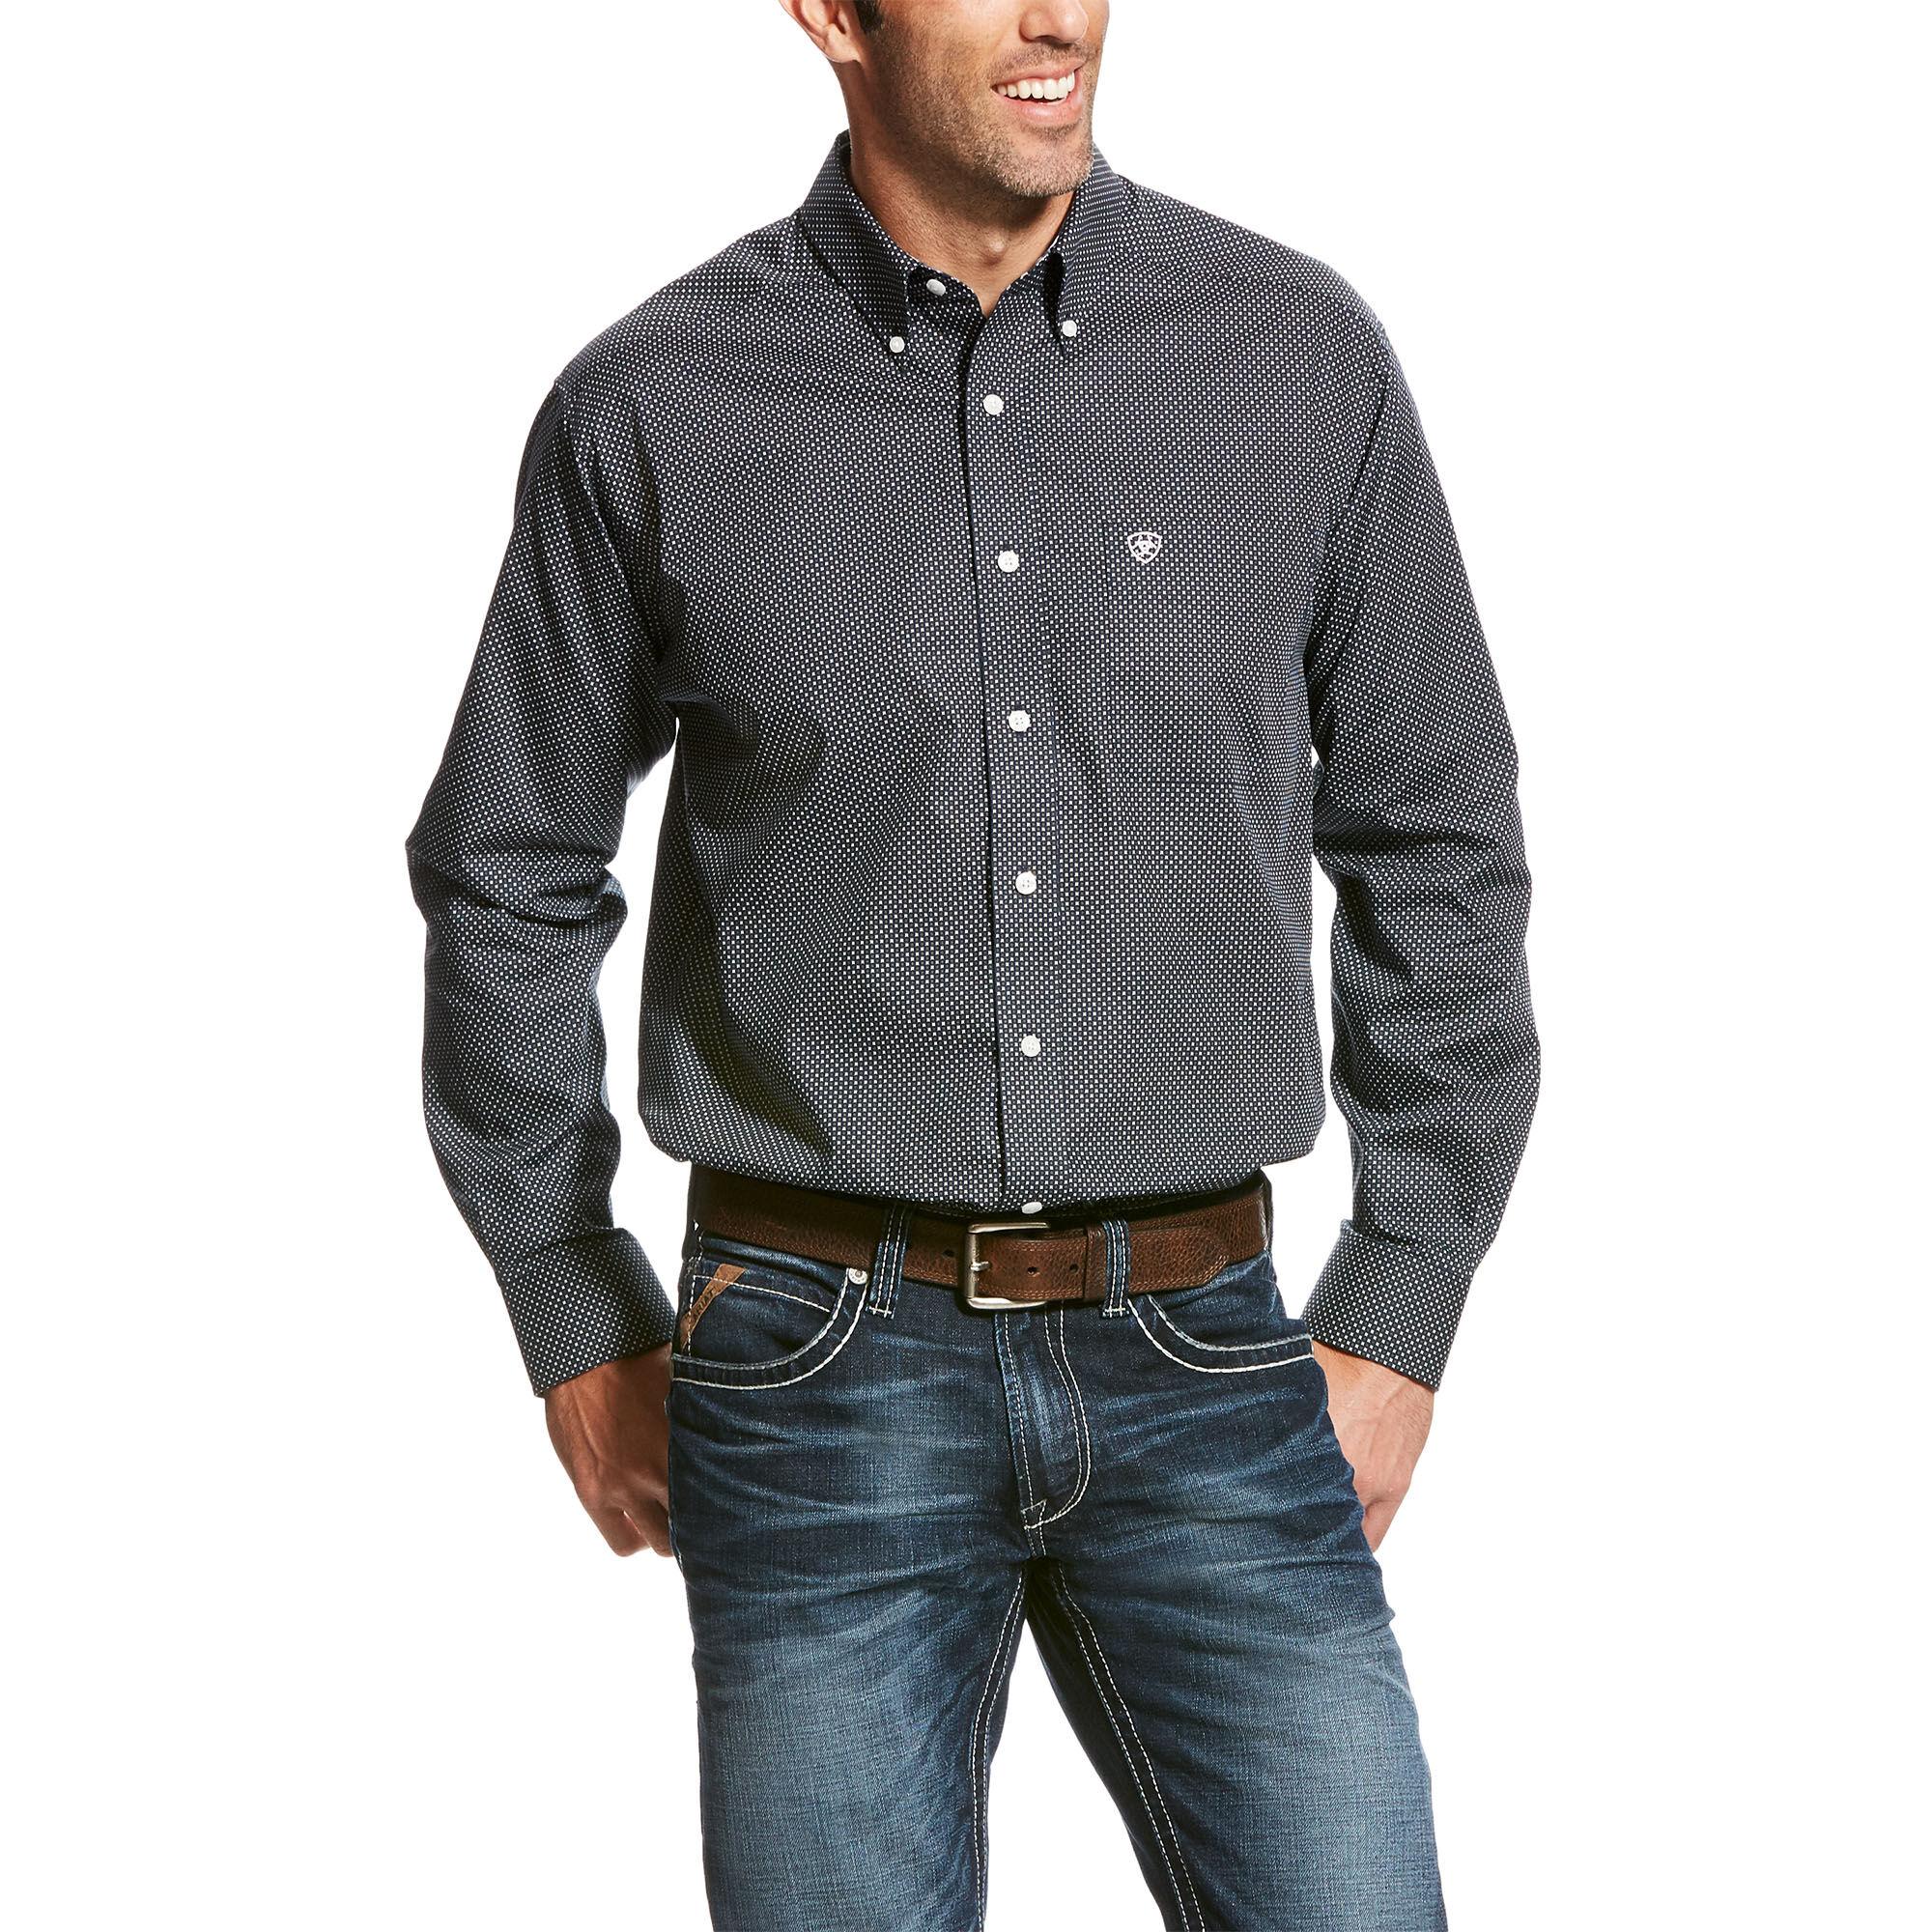 Wrinkle Free Uffner Shirt